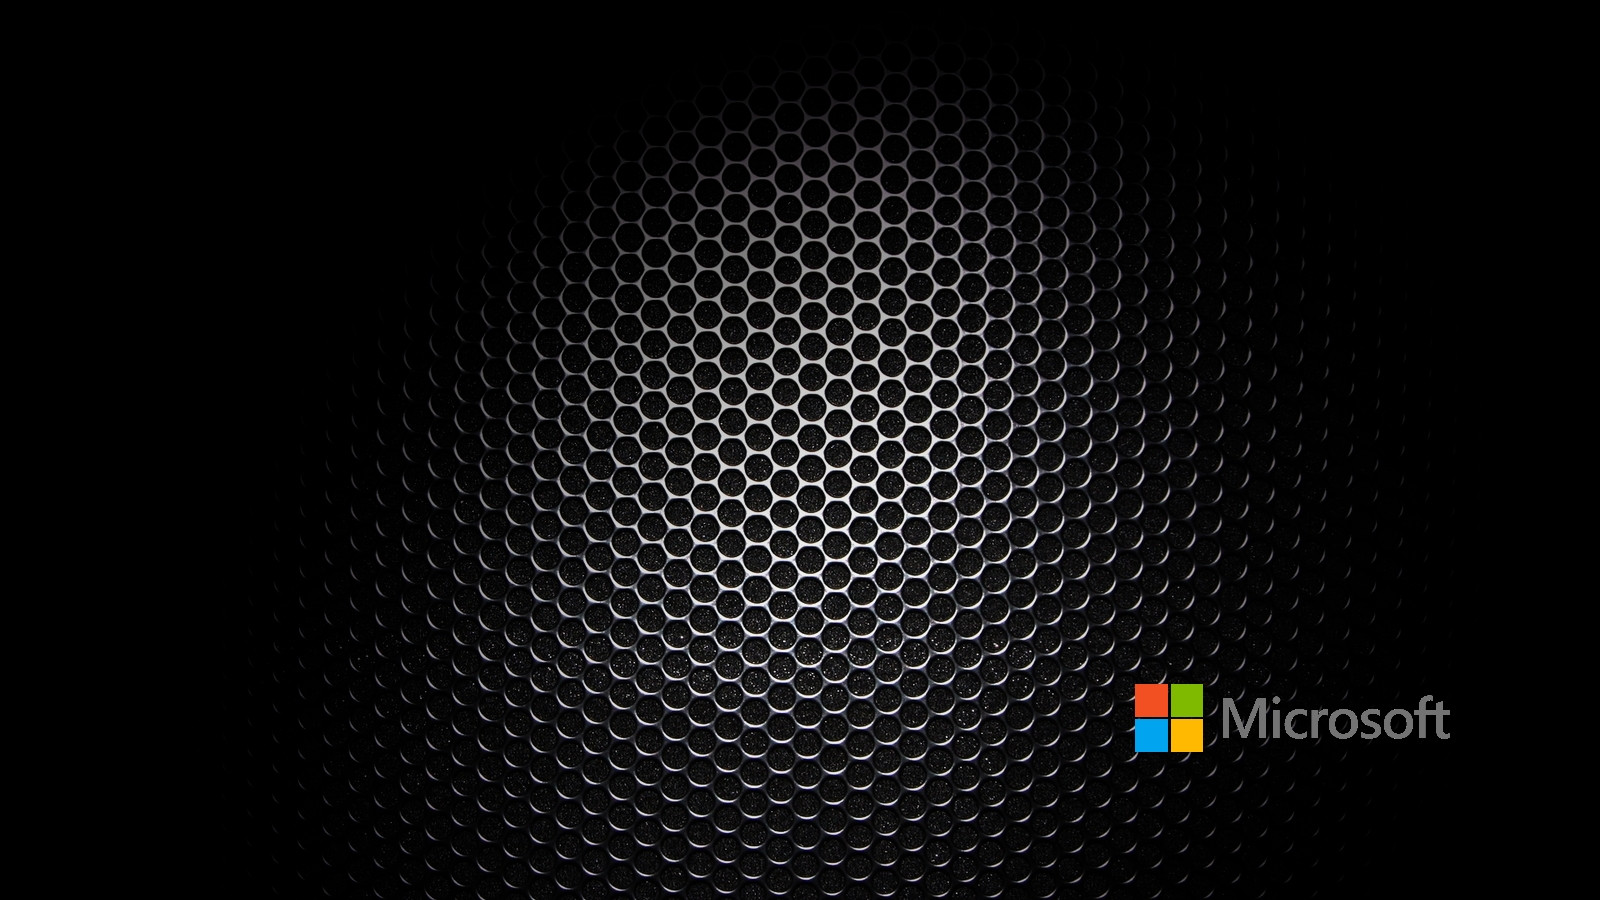 Microsoft Free Backgrounds - WallpaperSafari